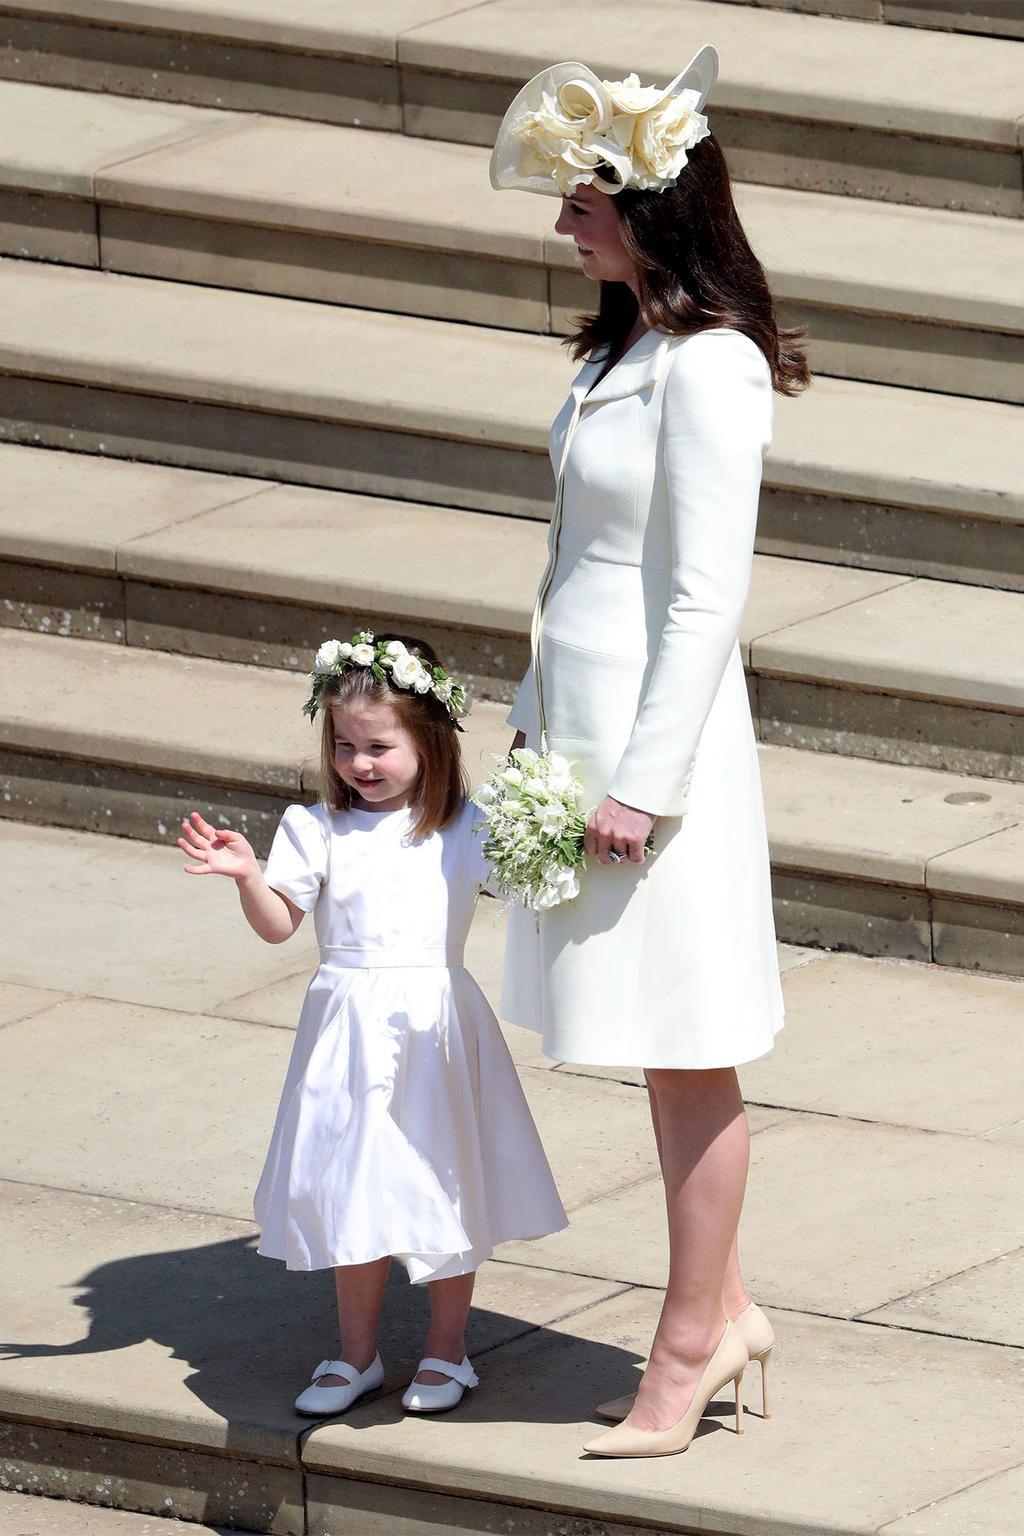 Kate Middleton re wears her Alexander McQueen coat dress for